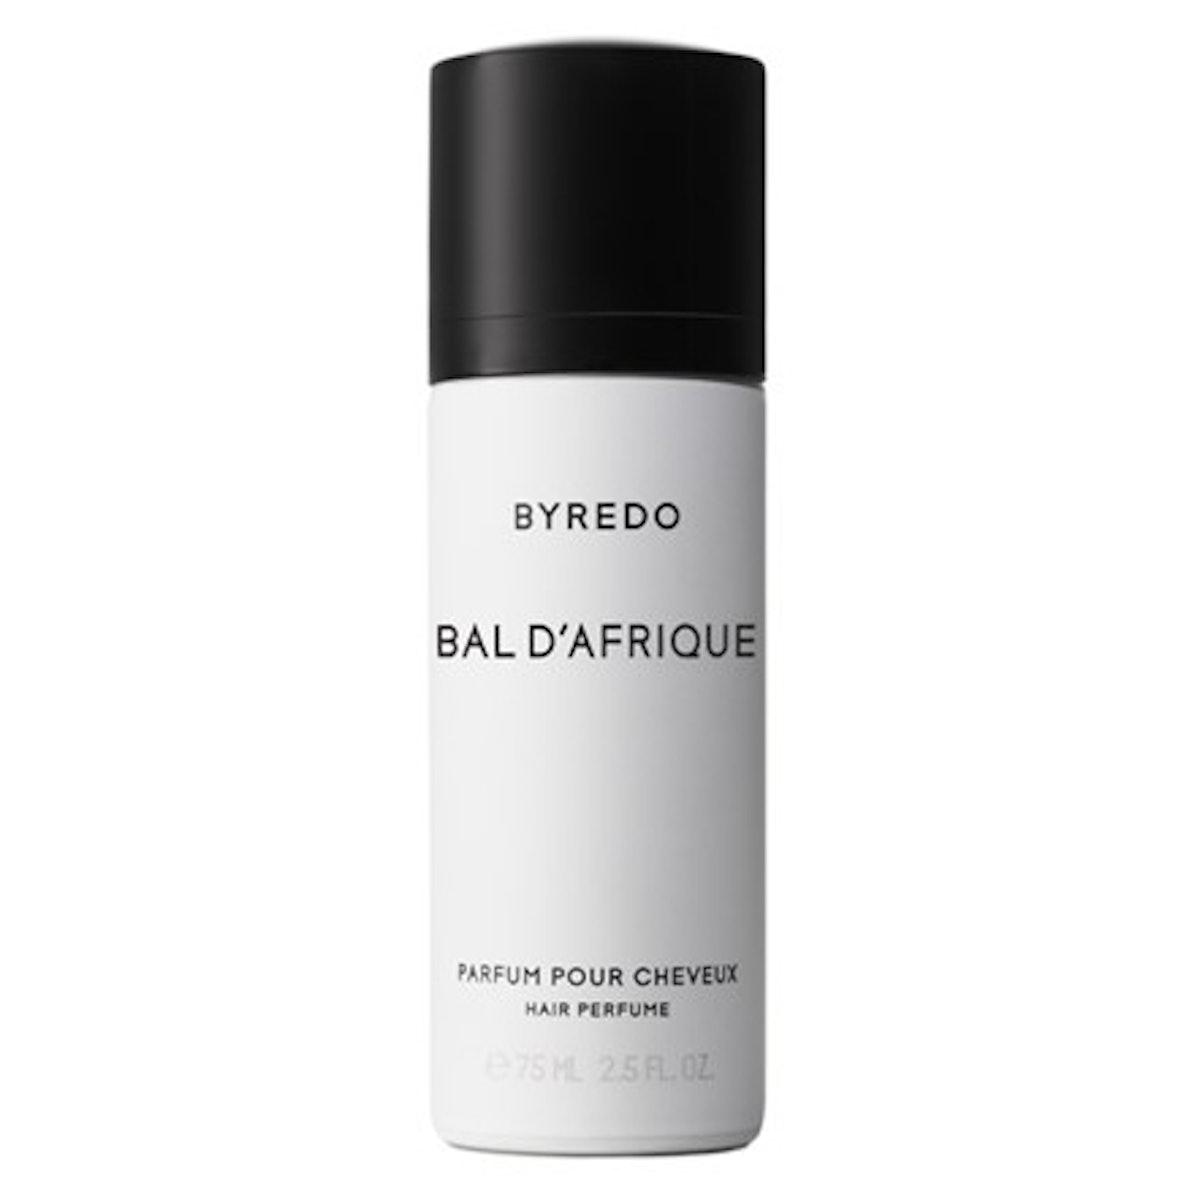 Byredo Bal D'Afrique Hair Perfume